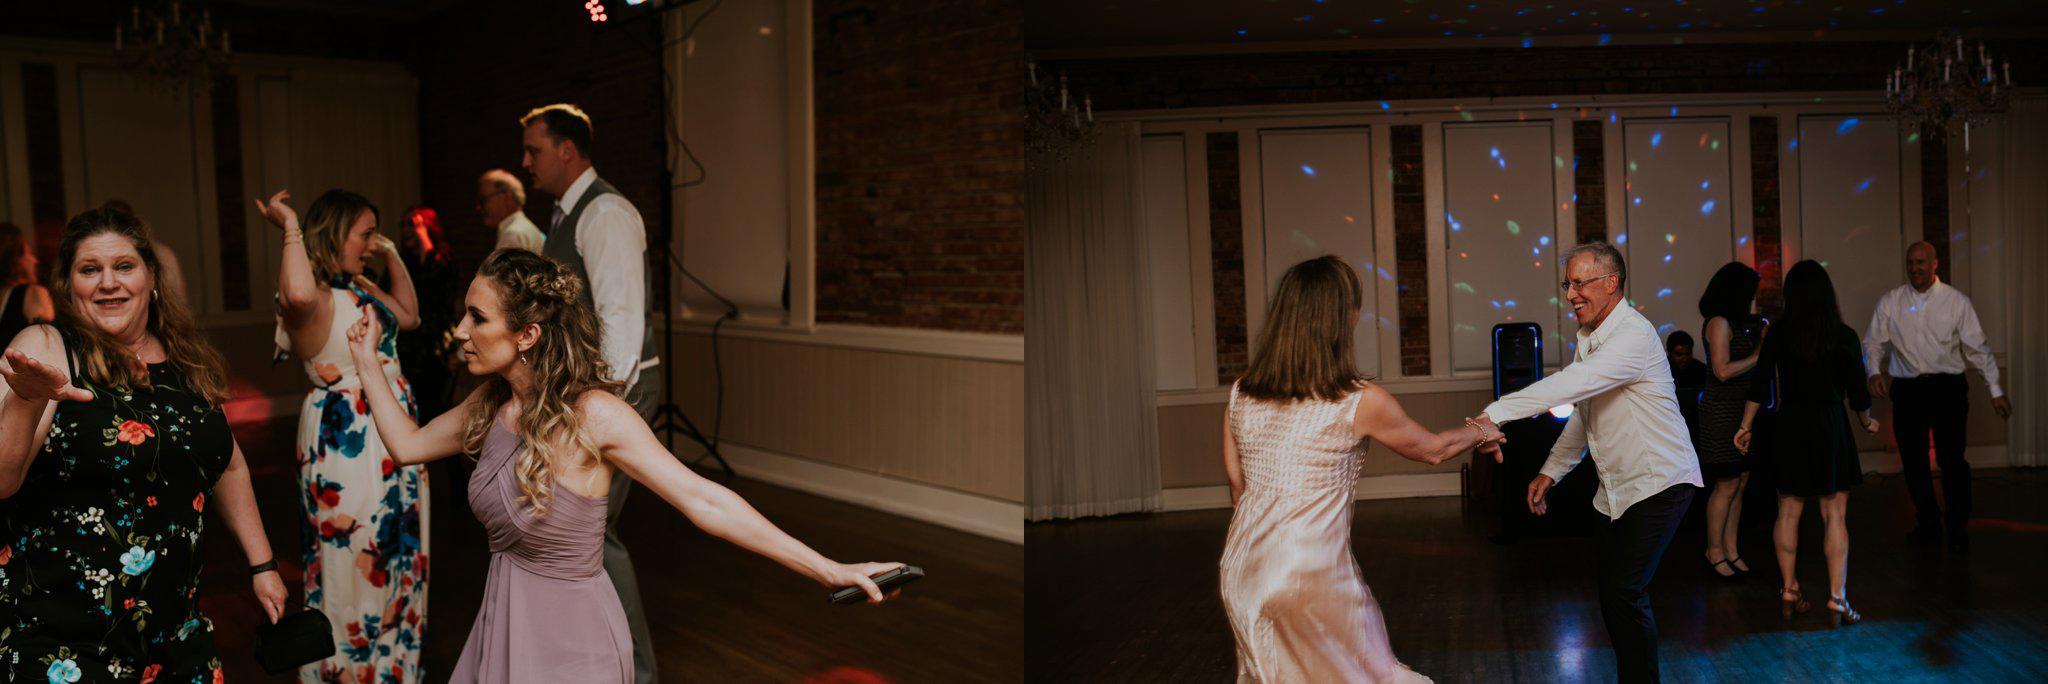 hollywood-school-house-wedding-seattle-photographer-caitlyn-nikula-119.jpg